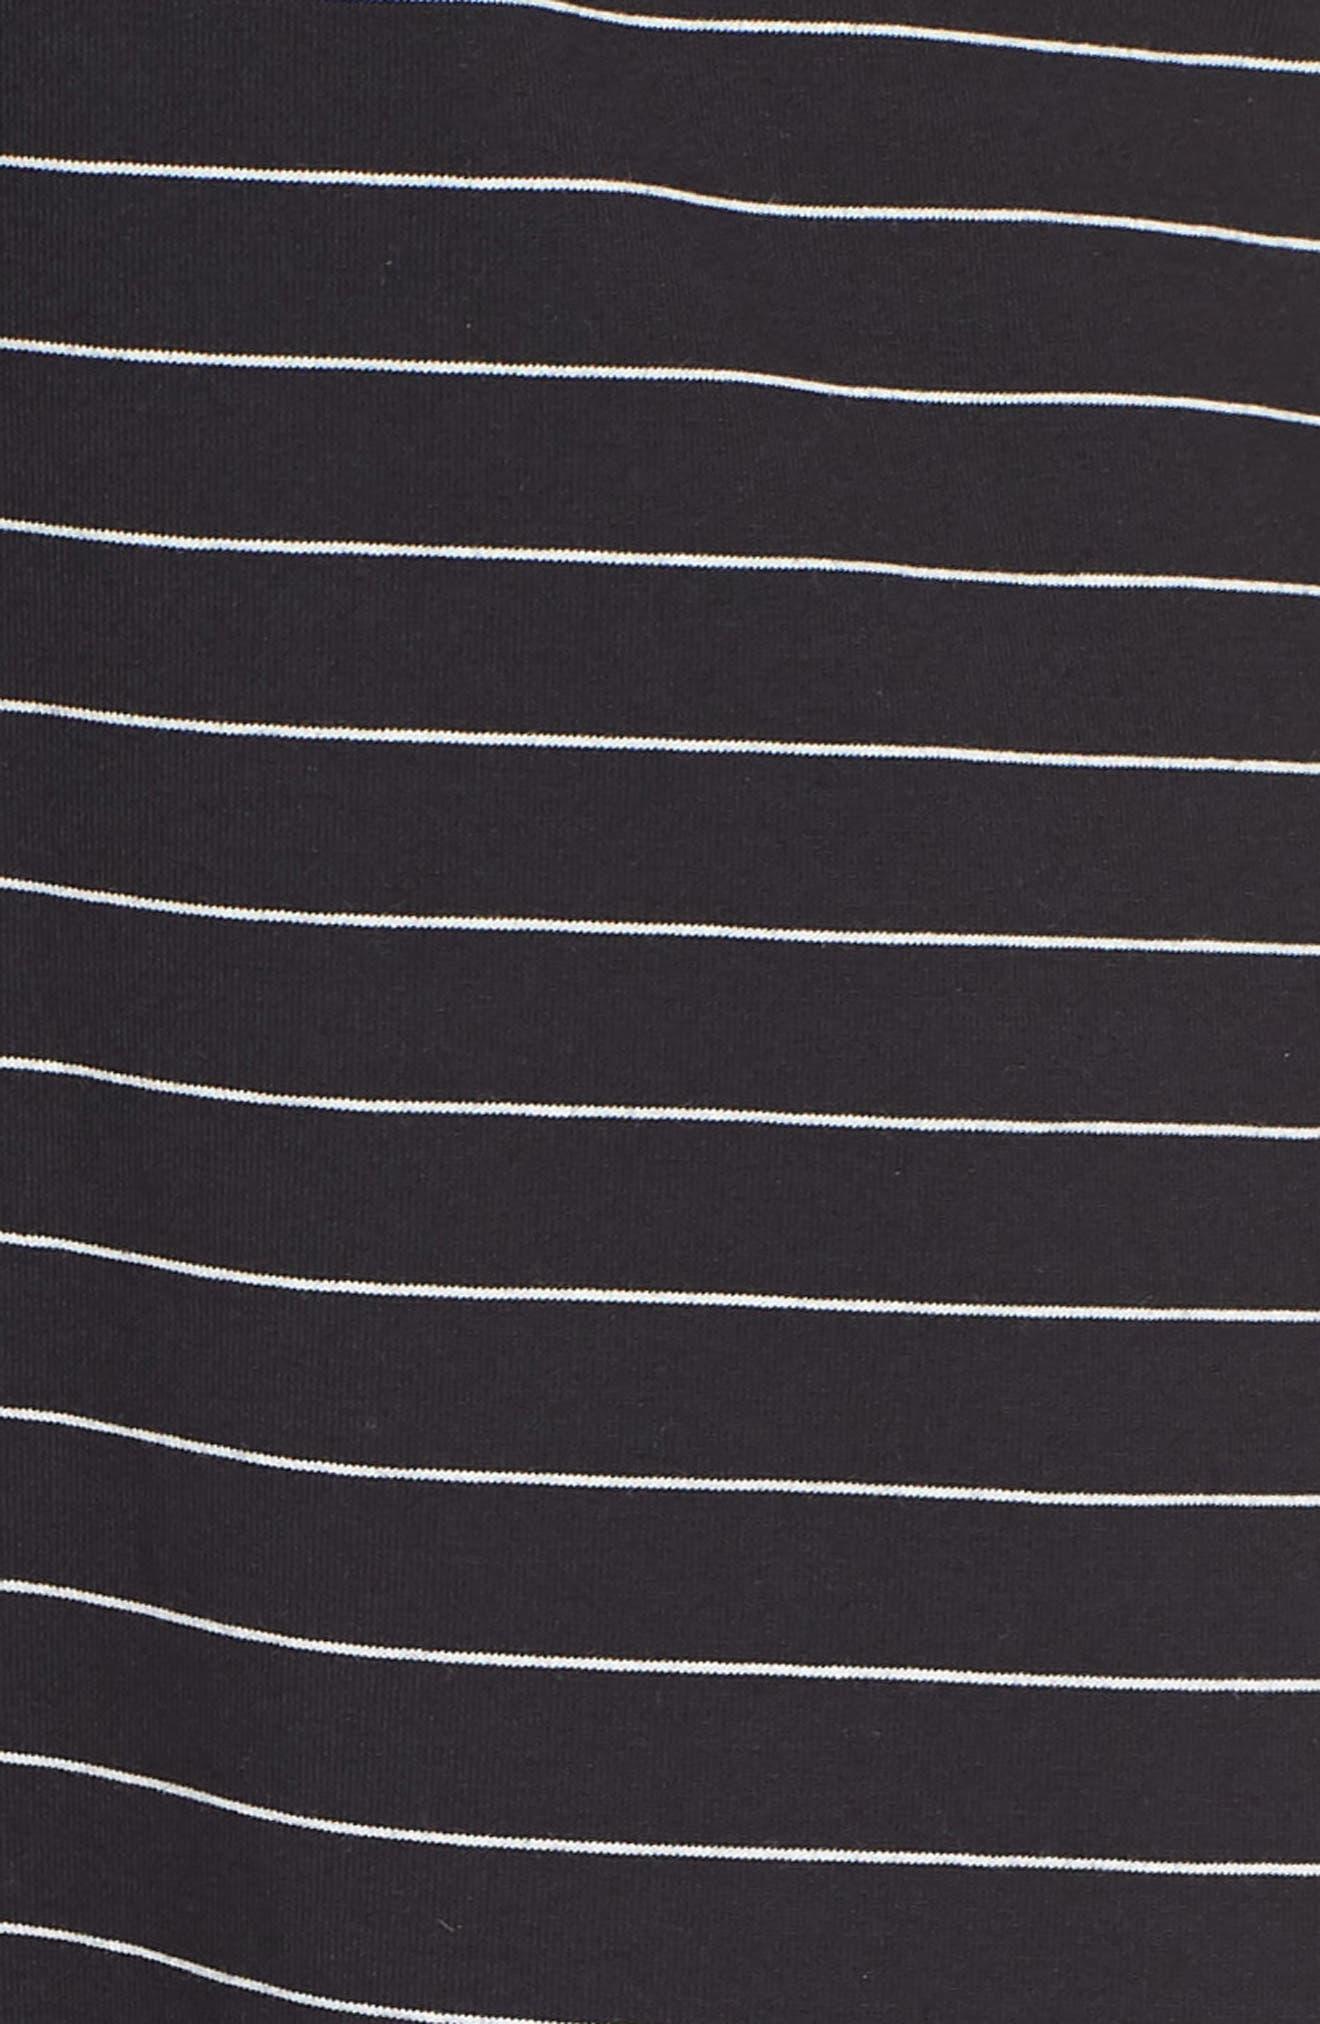 Suzanne Knot Front Dress,                             Alternate thumbnail 7, color,                             Black